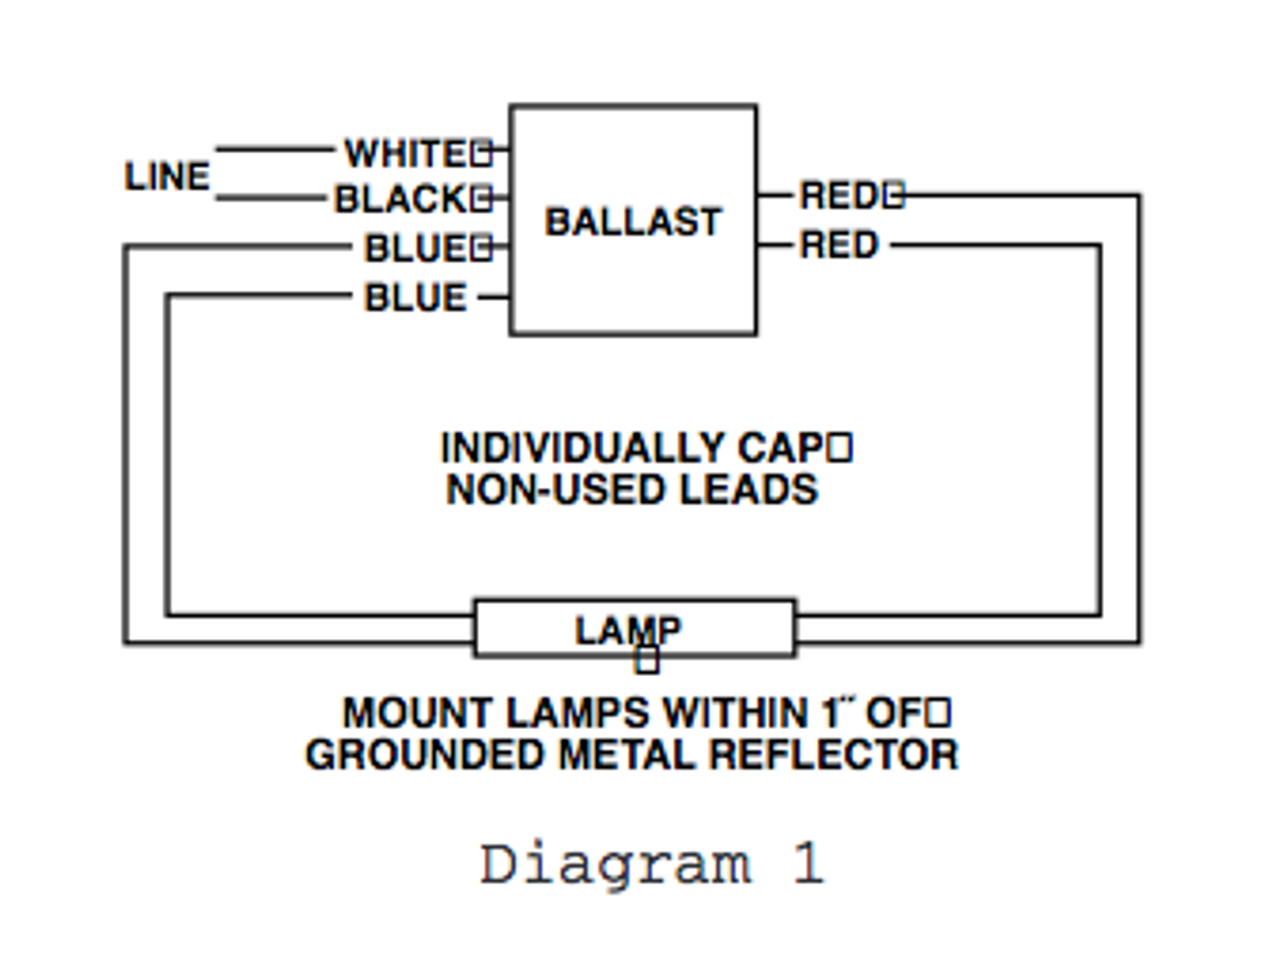 Ge Fluorescent Ballast Wiring Diagram Mercury 25 Hp Outboard Wiring Diagram Crvtyu Bayau Madfish It